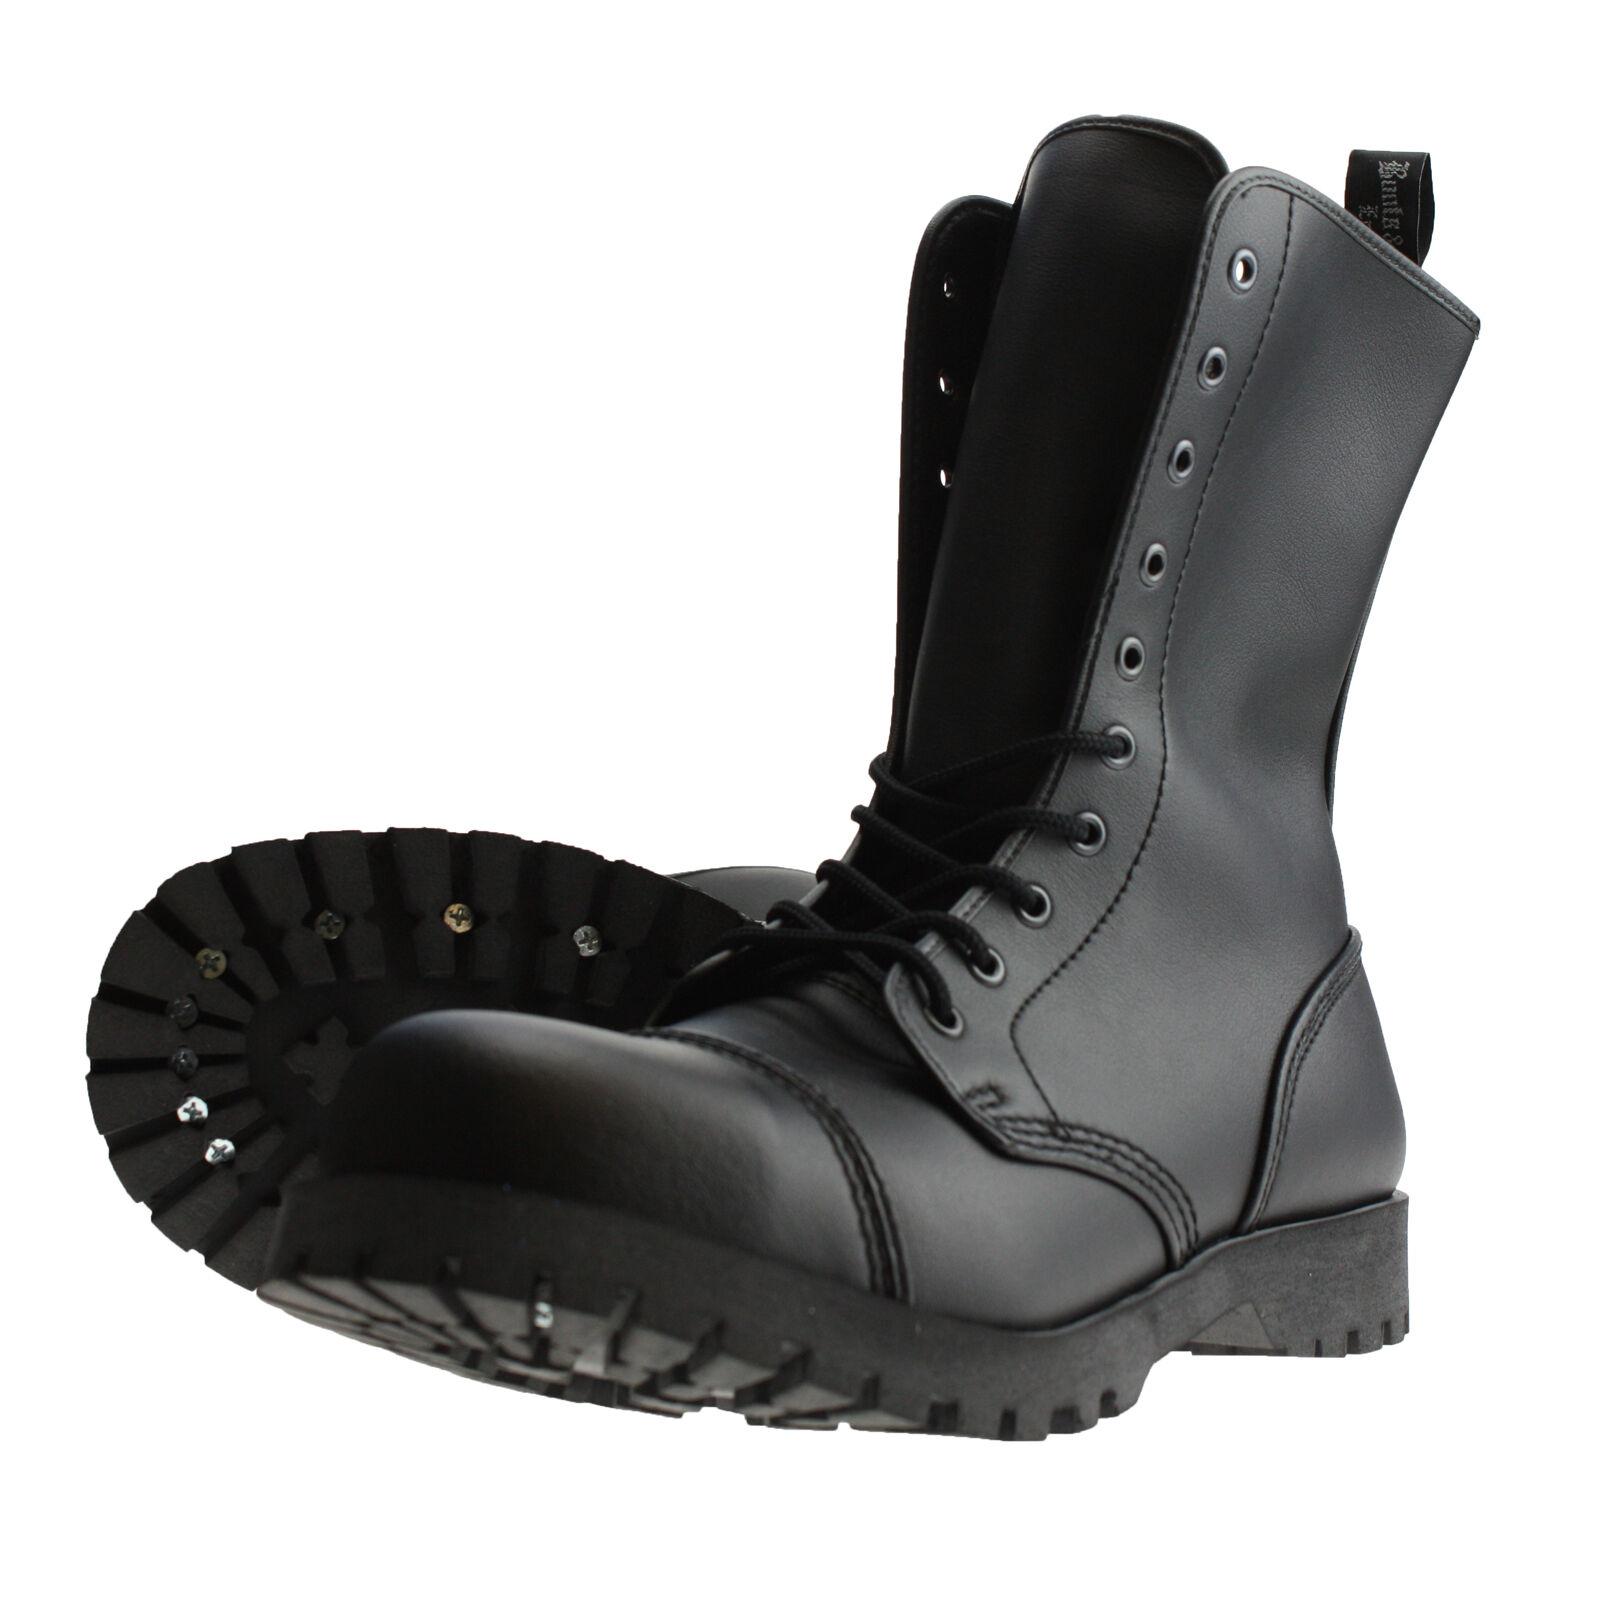 Boots and Braces 10-Loch Stiefel Vegetarian Vegi Vegane Springerstiefel black